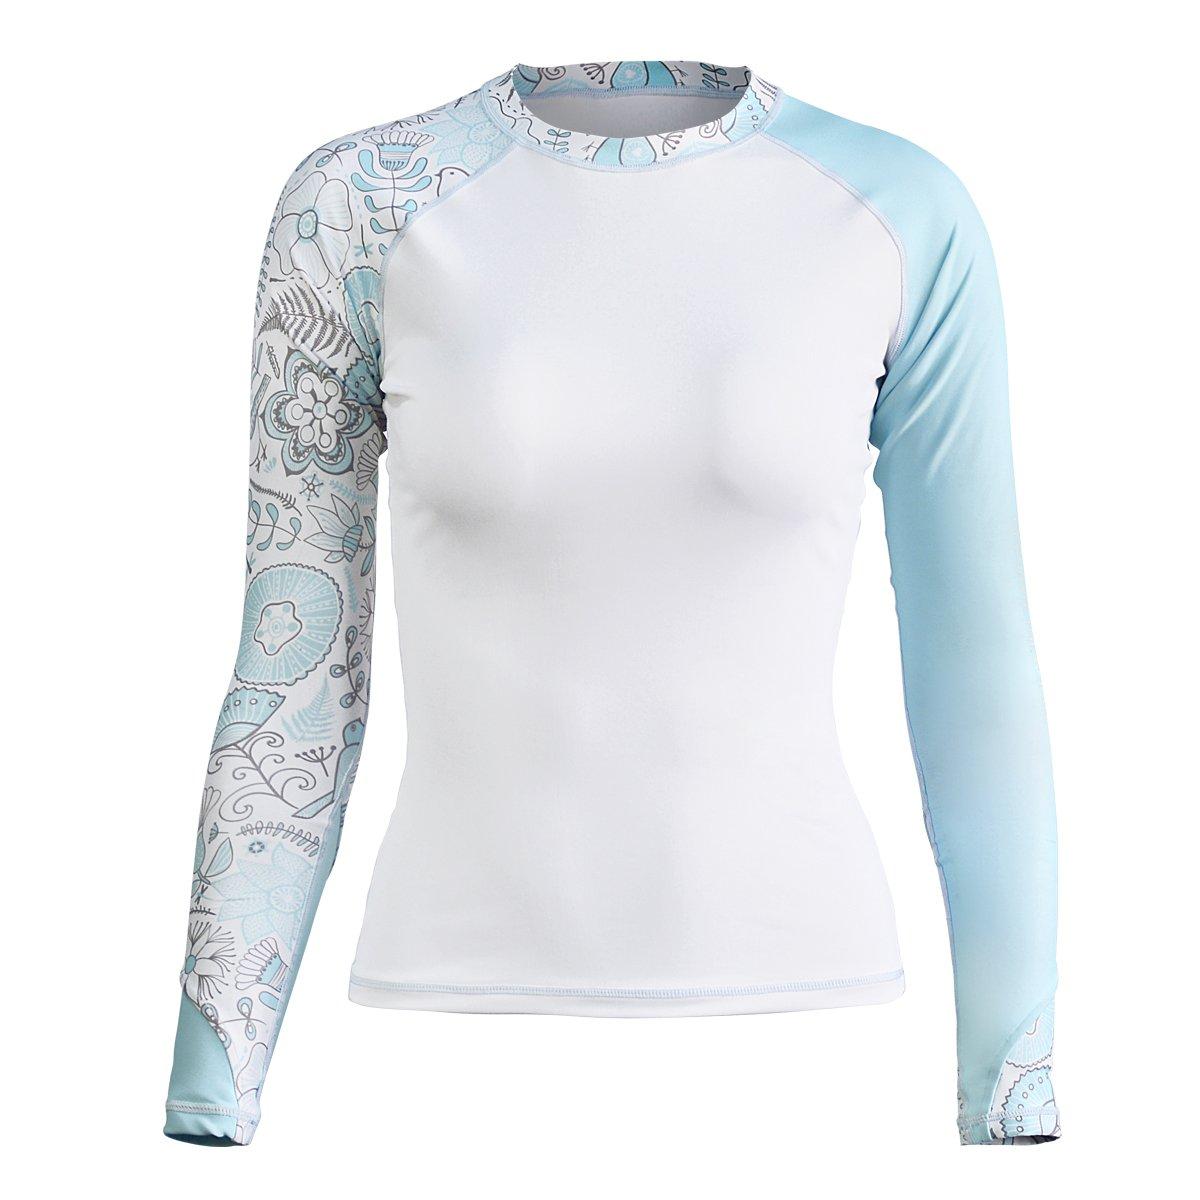 LayaTone Rash Guard Women Long Sleeves Swimsuit Swimwear Tops Girl Dive Skin Surf Suit Water Sports T-Shirts Girl by LayaTone